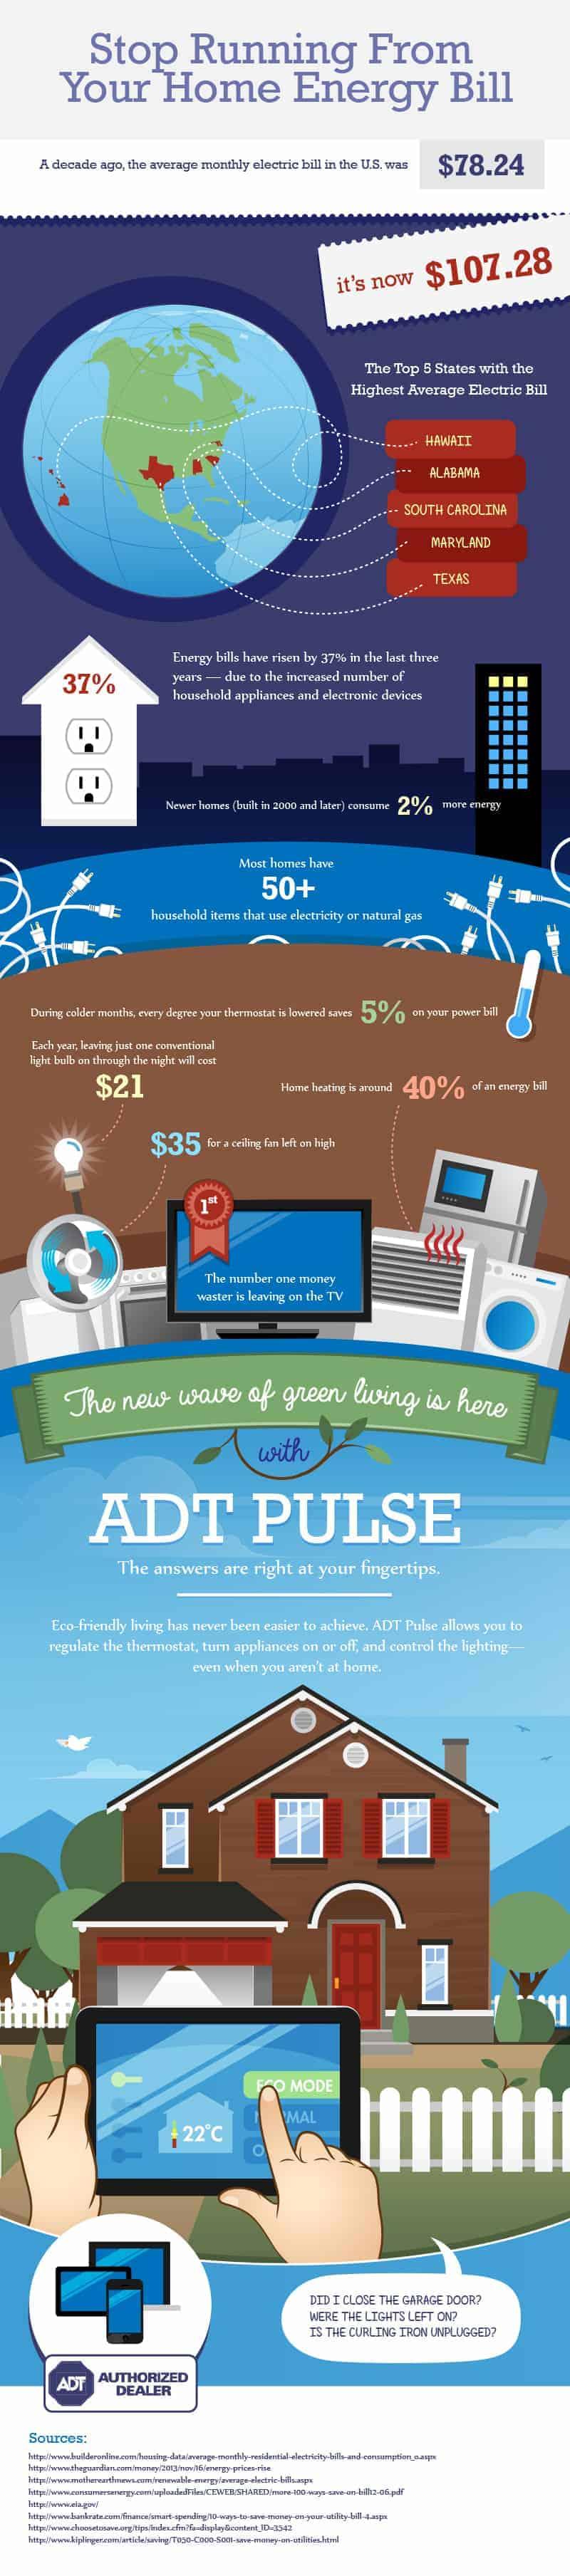 ADTPulse-Infographic-mod2